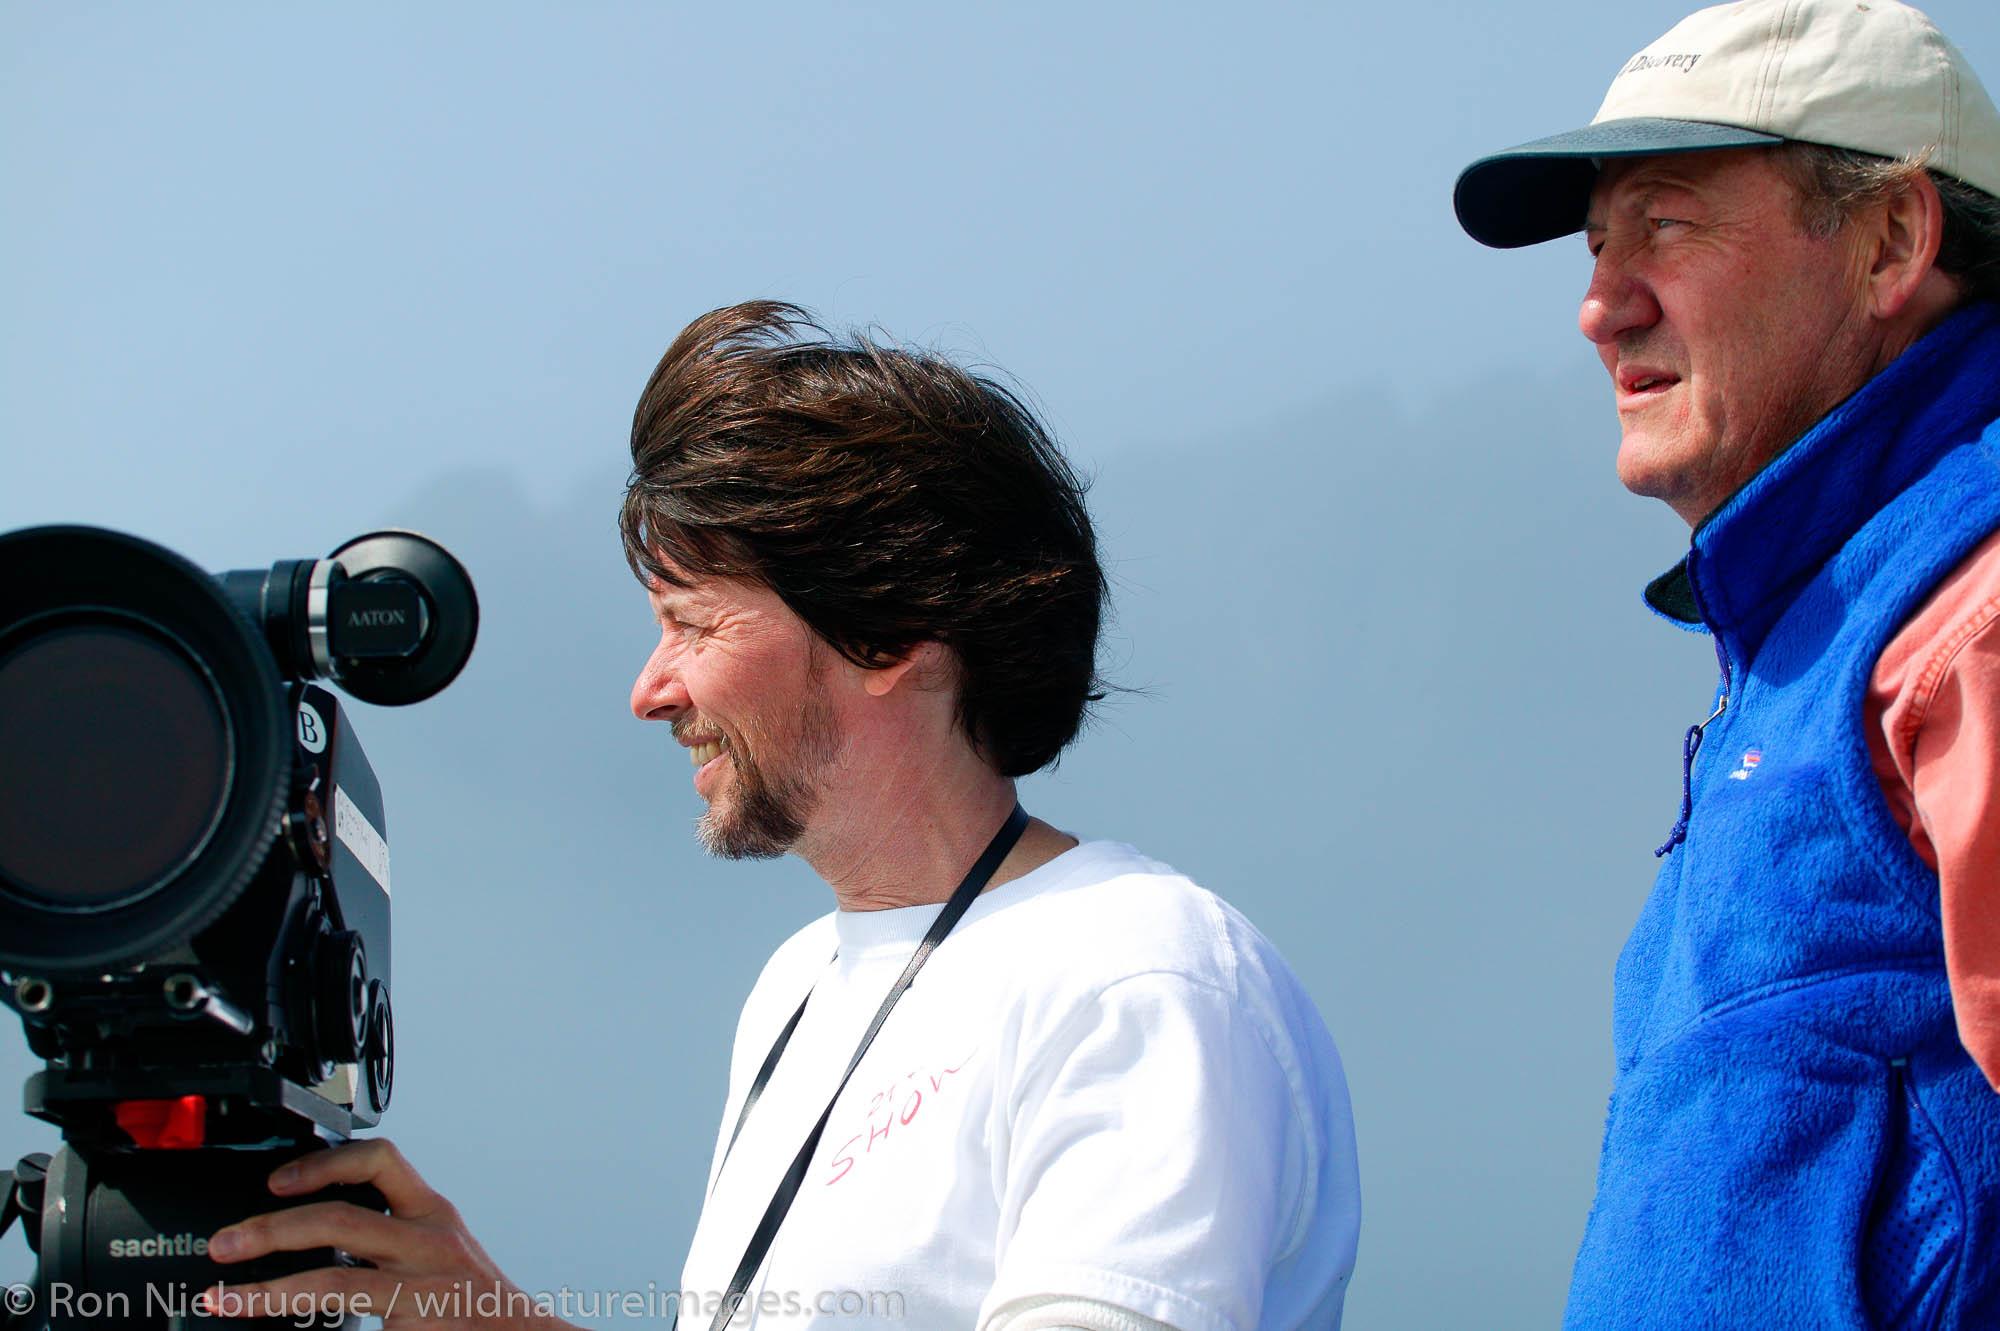 Dayton Duncan, and Ken Burns filming in Aialik Bay, Kenai Fjords National Park, Alaska.